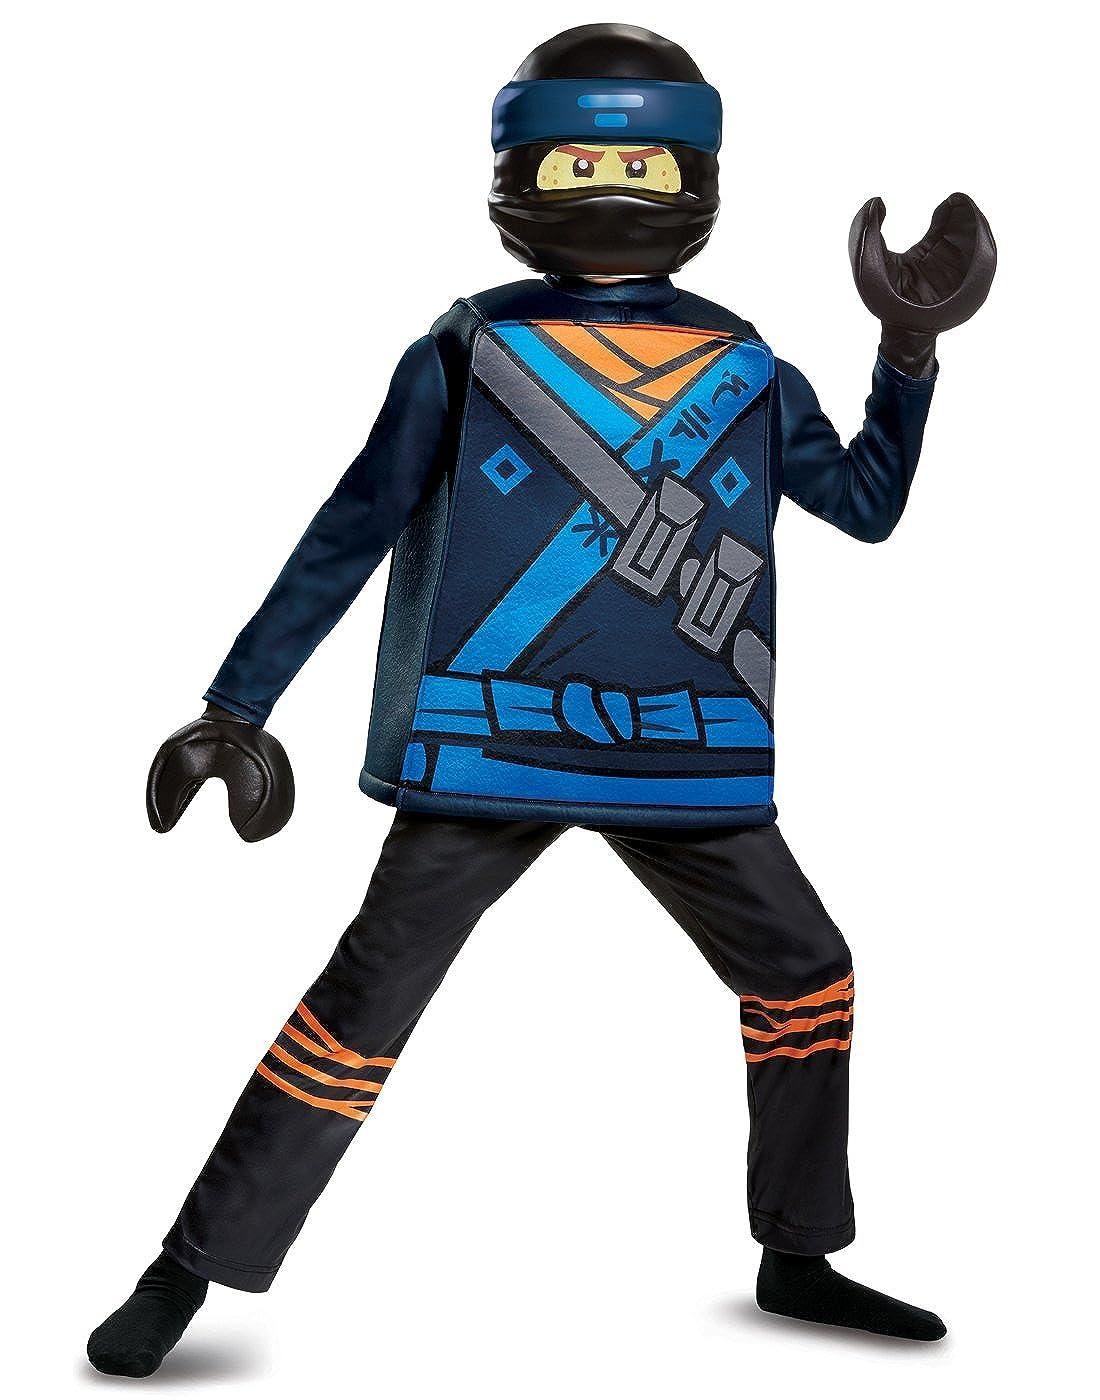 Amazon.com: Lego Ninjago Jay Child Costume Deluxe Boys ...